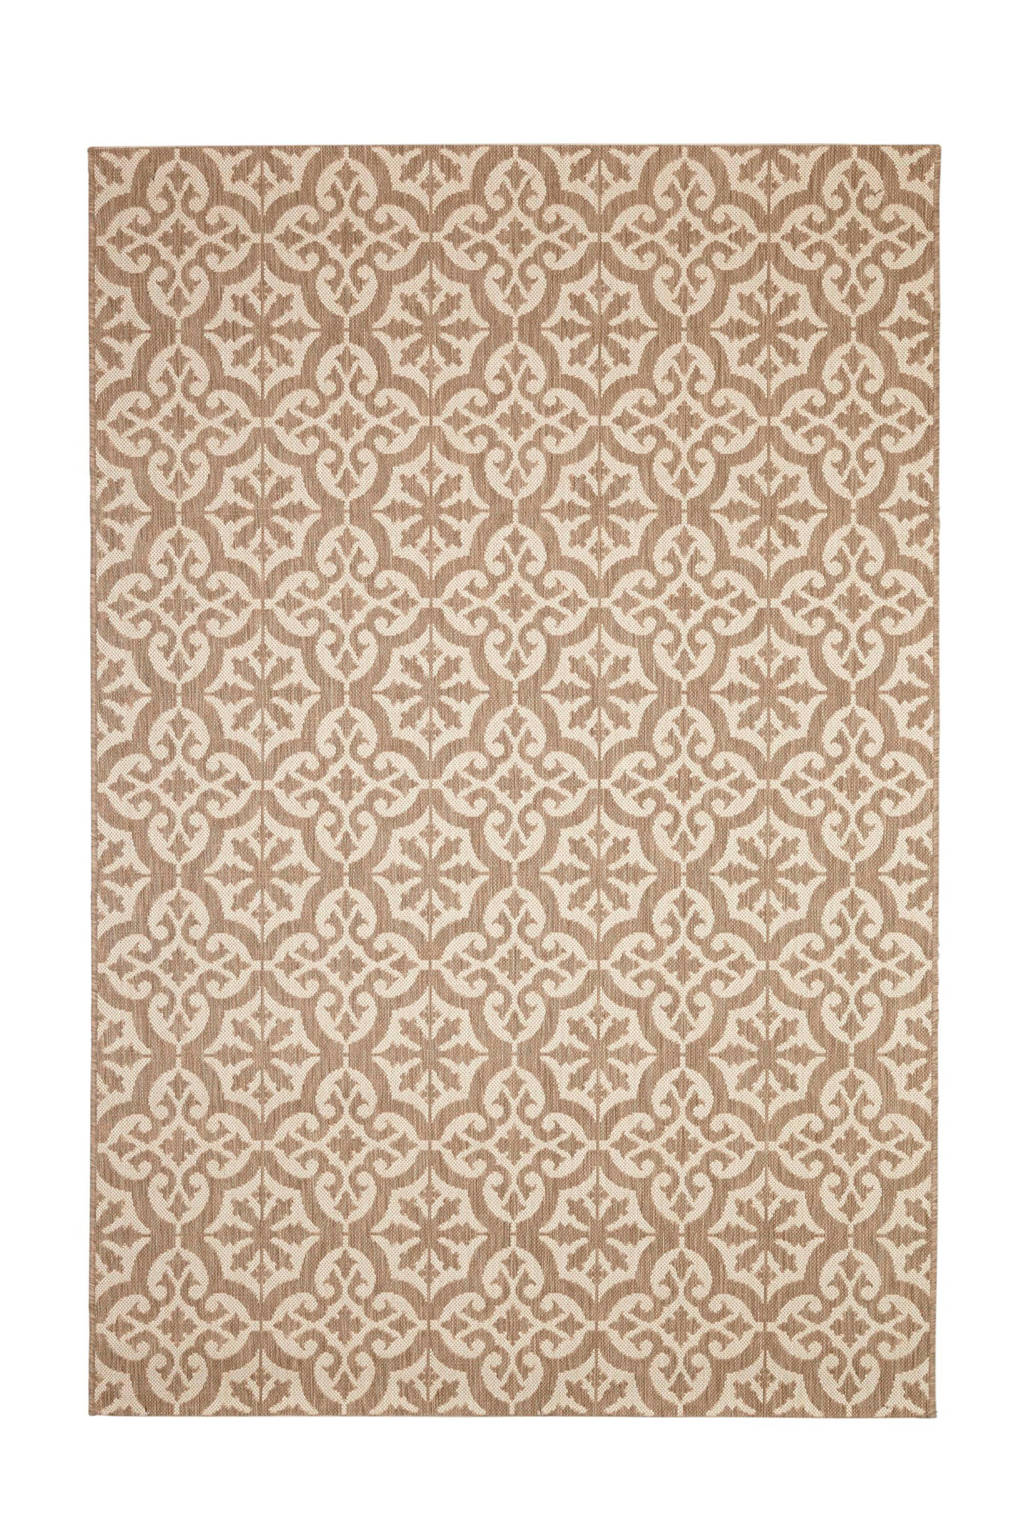 whkmp's own Vloerkleed  (230x160 cm), Bruin/ecru